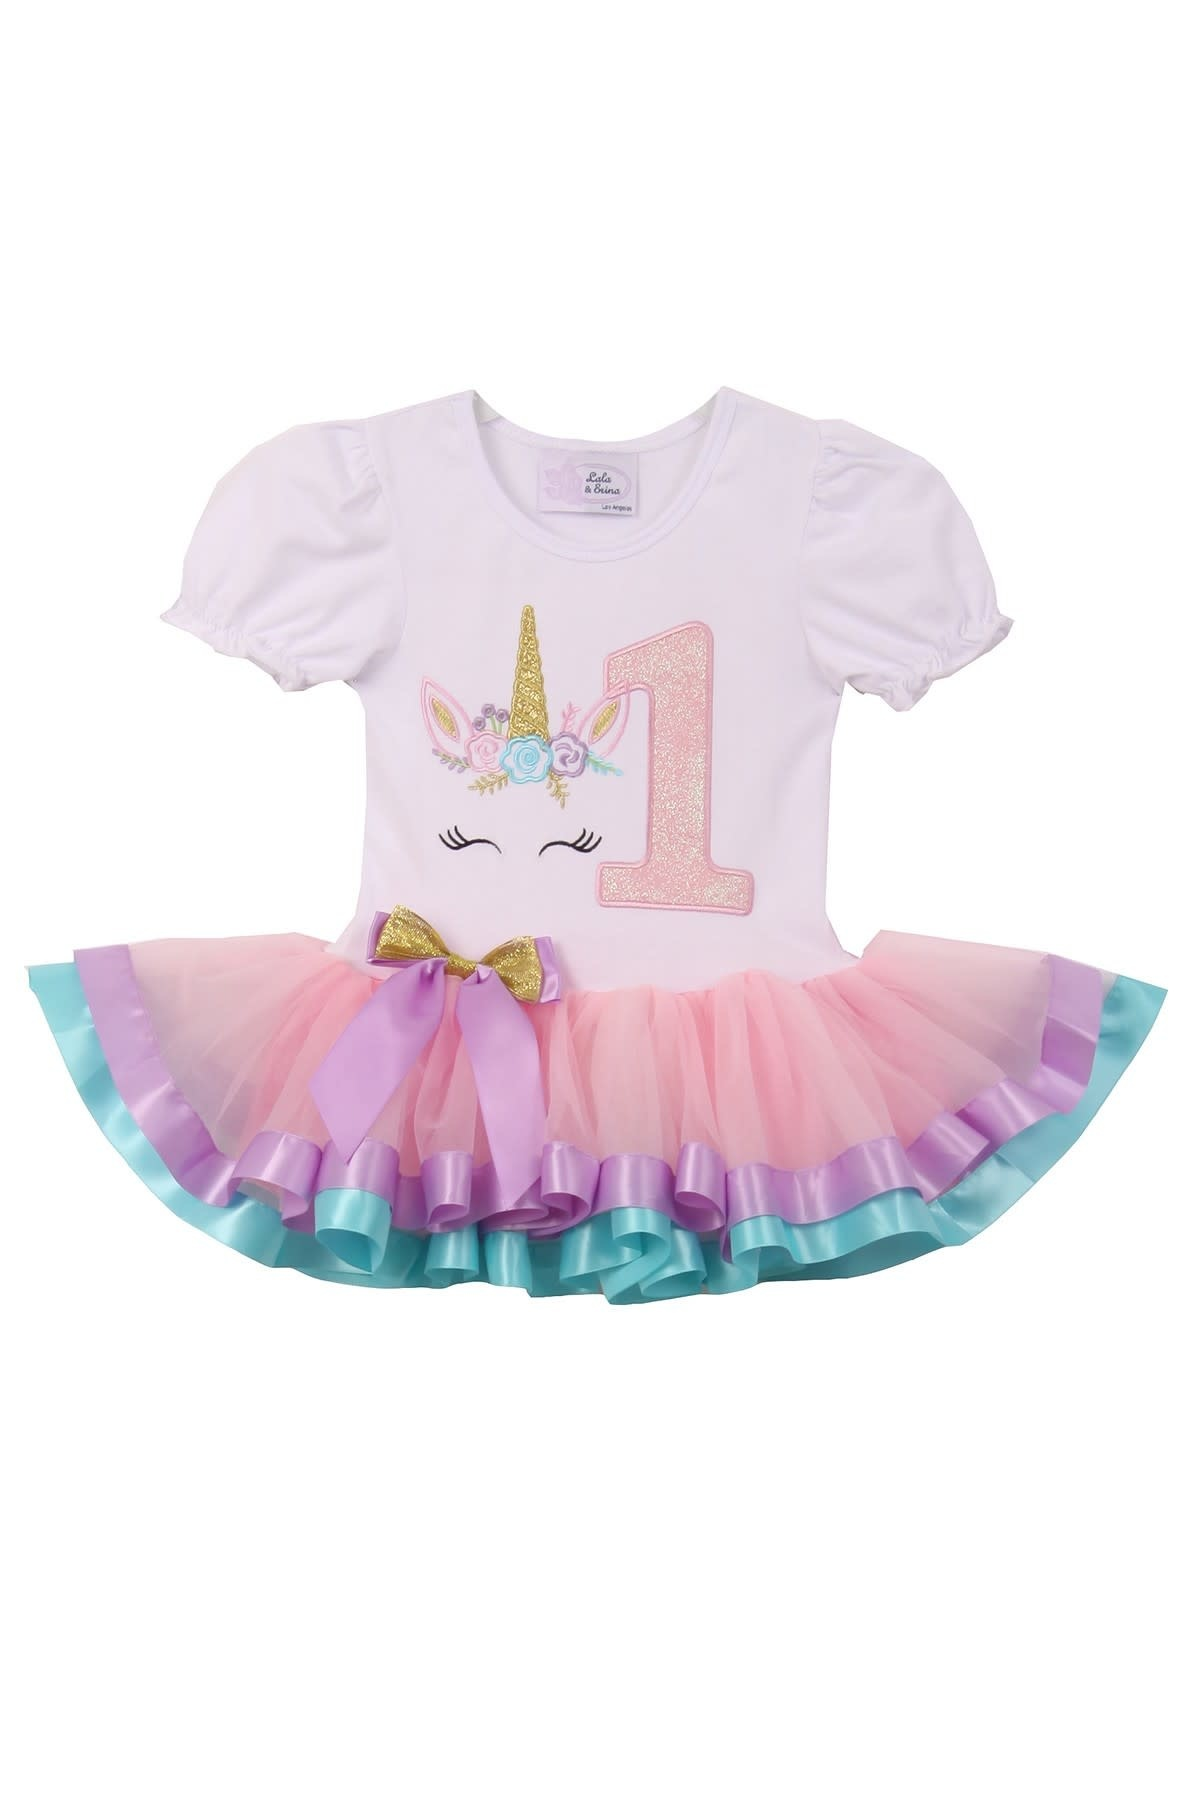 Cinderella Couture Party Dress Tutus